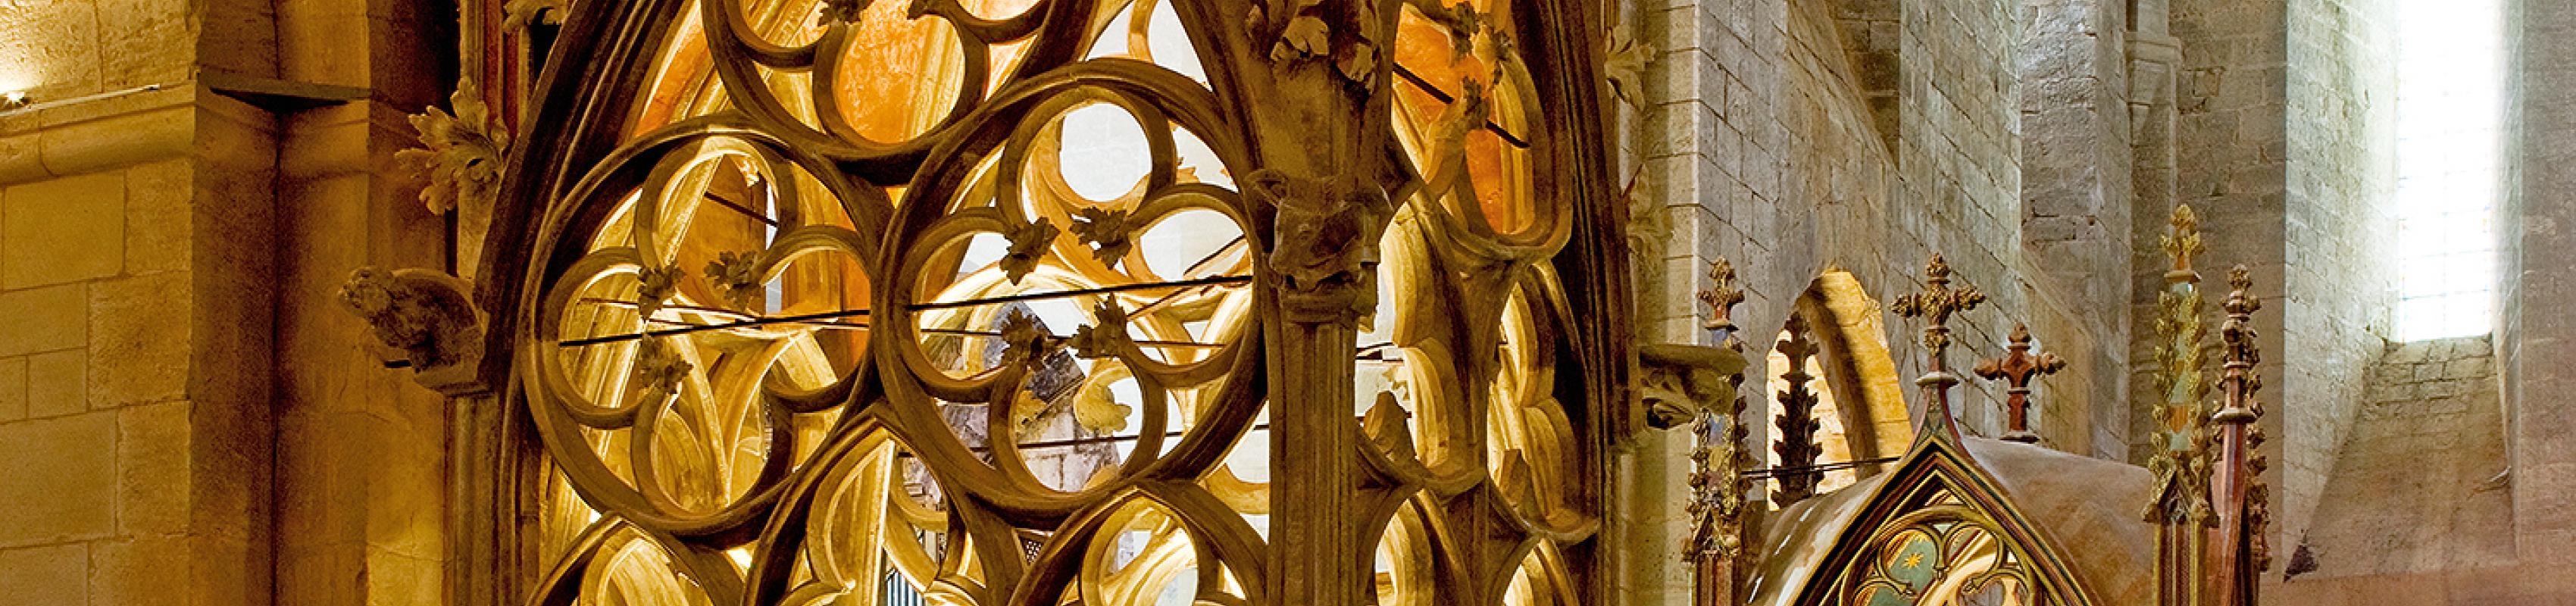 Monument funerari de Jaume II i Blanca d'Anjou (Autor: Pepo Segura)